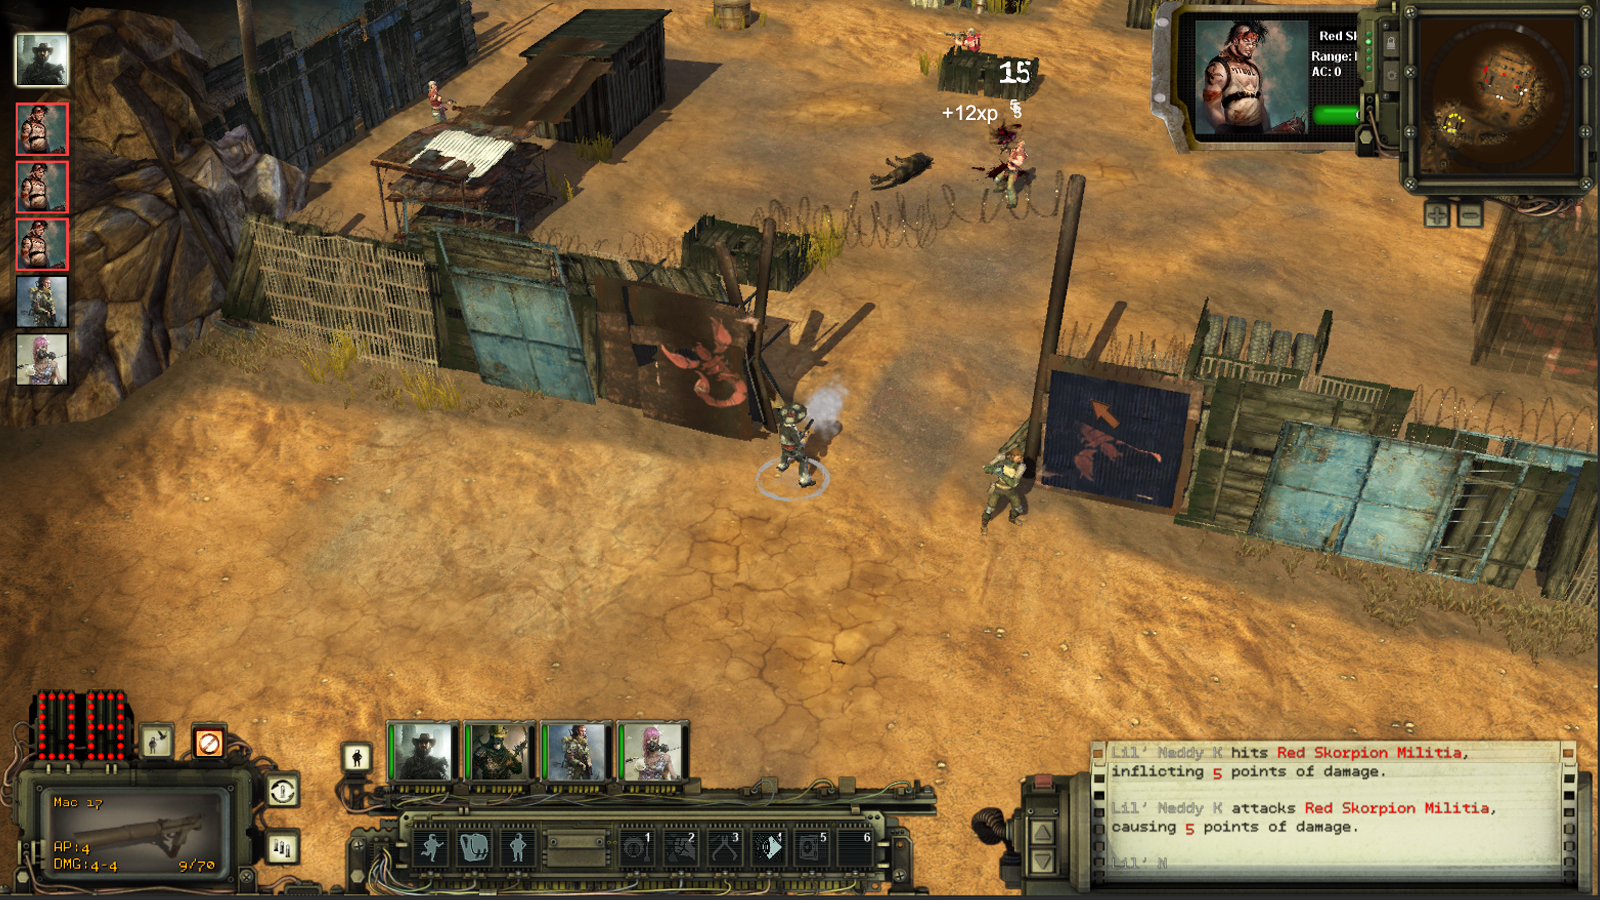 Galerie: Call of Duty, Men of War, Magicka, Diablo 86736